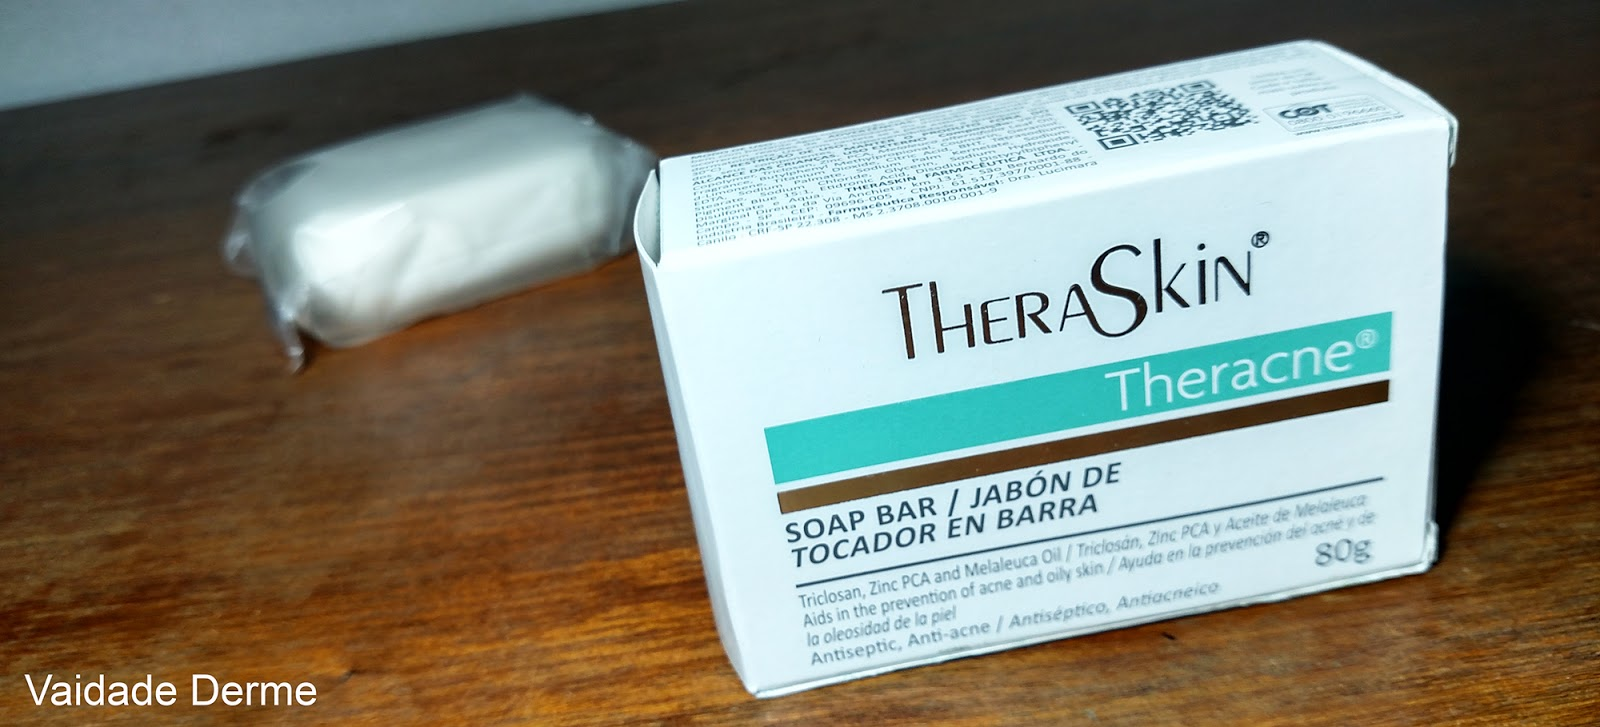 Theraskin Theracne Sabonete Barra e Líquido